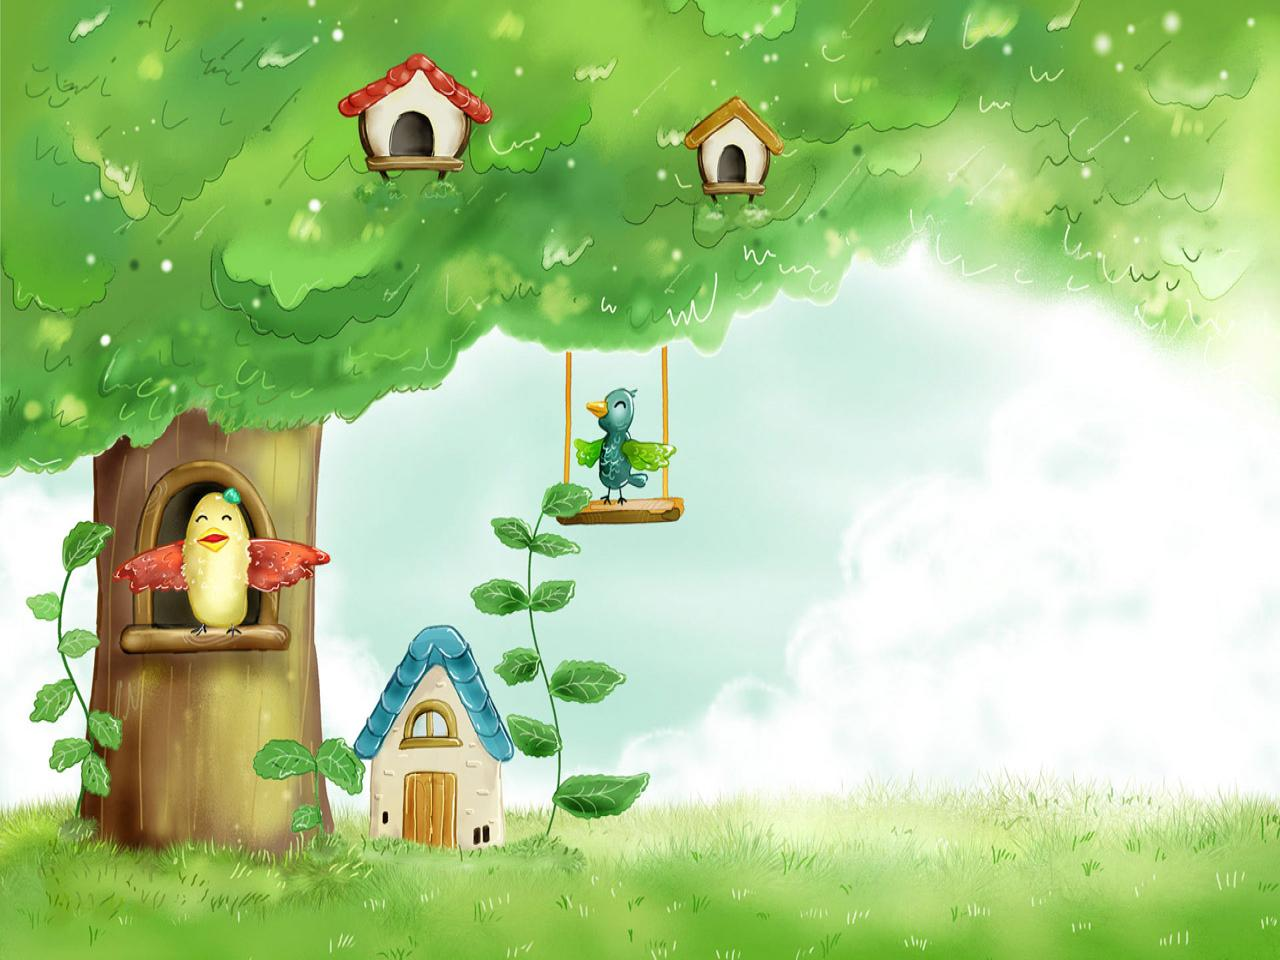 Cute Spring Backgrounds wallpaper wallpaper hd background desktop 1280x960